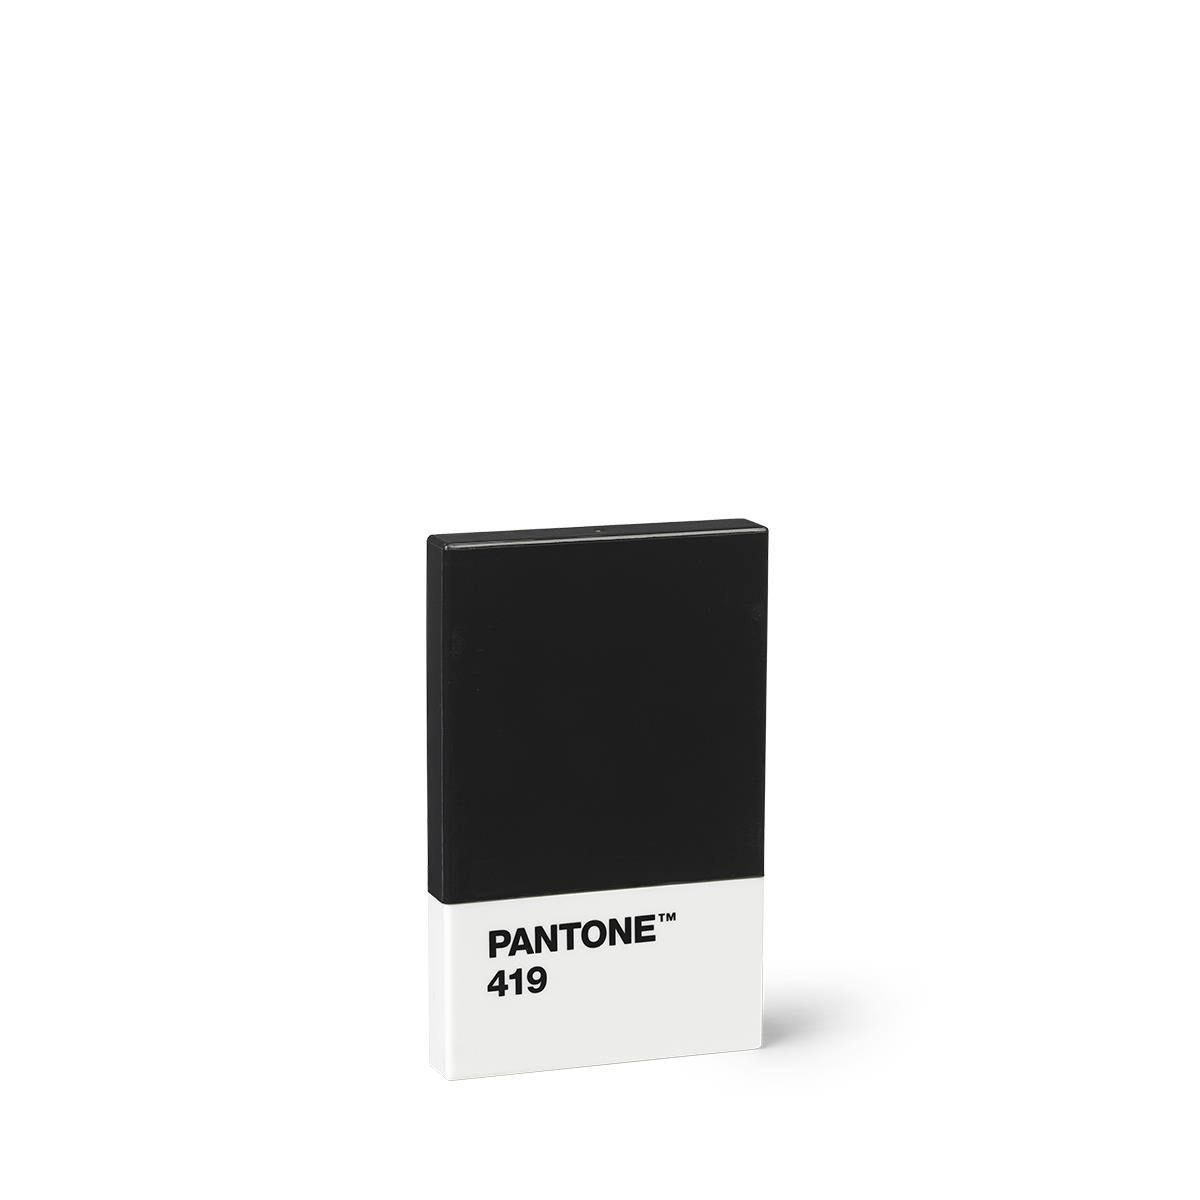 Kreditkarte Visitenkartenetui Schwarz 419 Set Von 2 Stück Pantone Büro Produkte